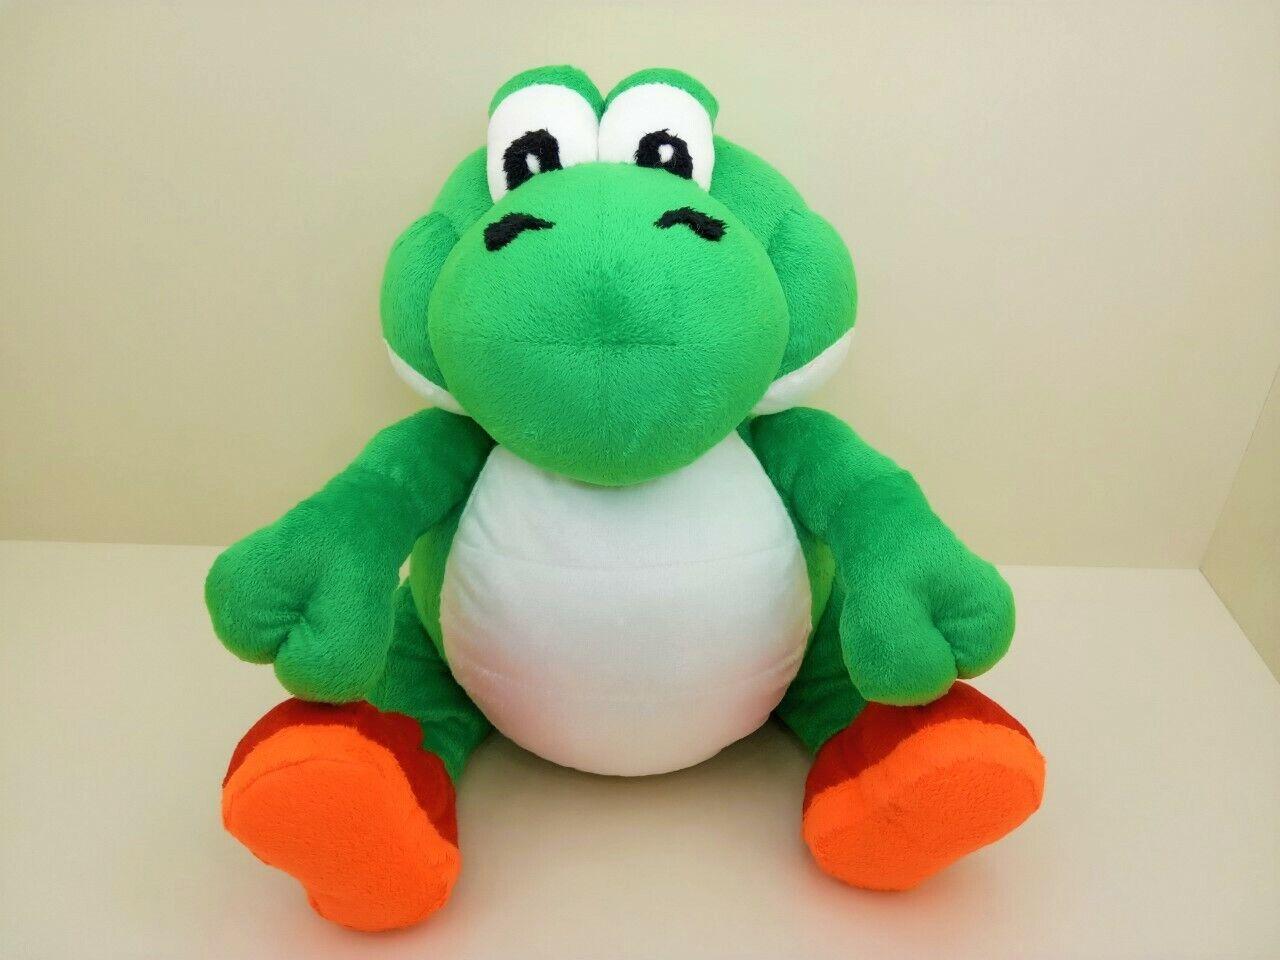 Fat Yoshi plush depressed toy art doll super mario dragon Grün dinosaur stuffed